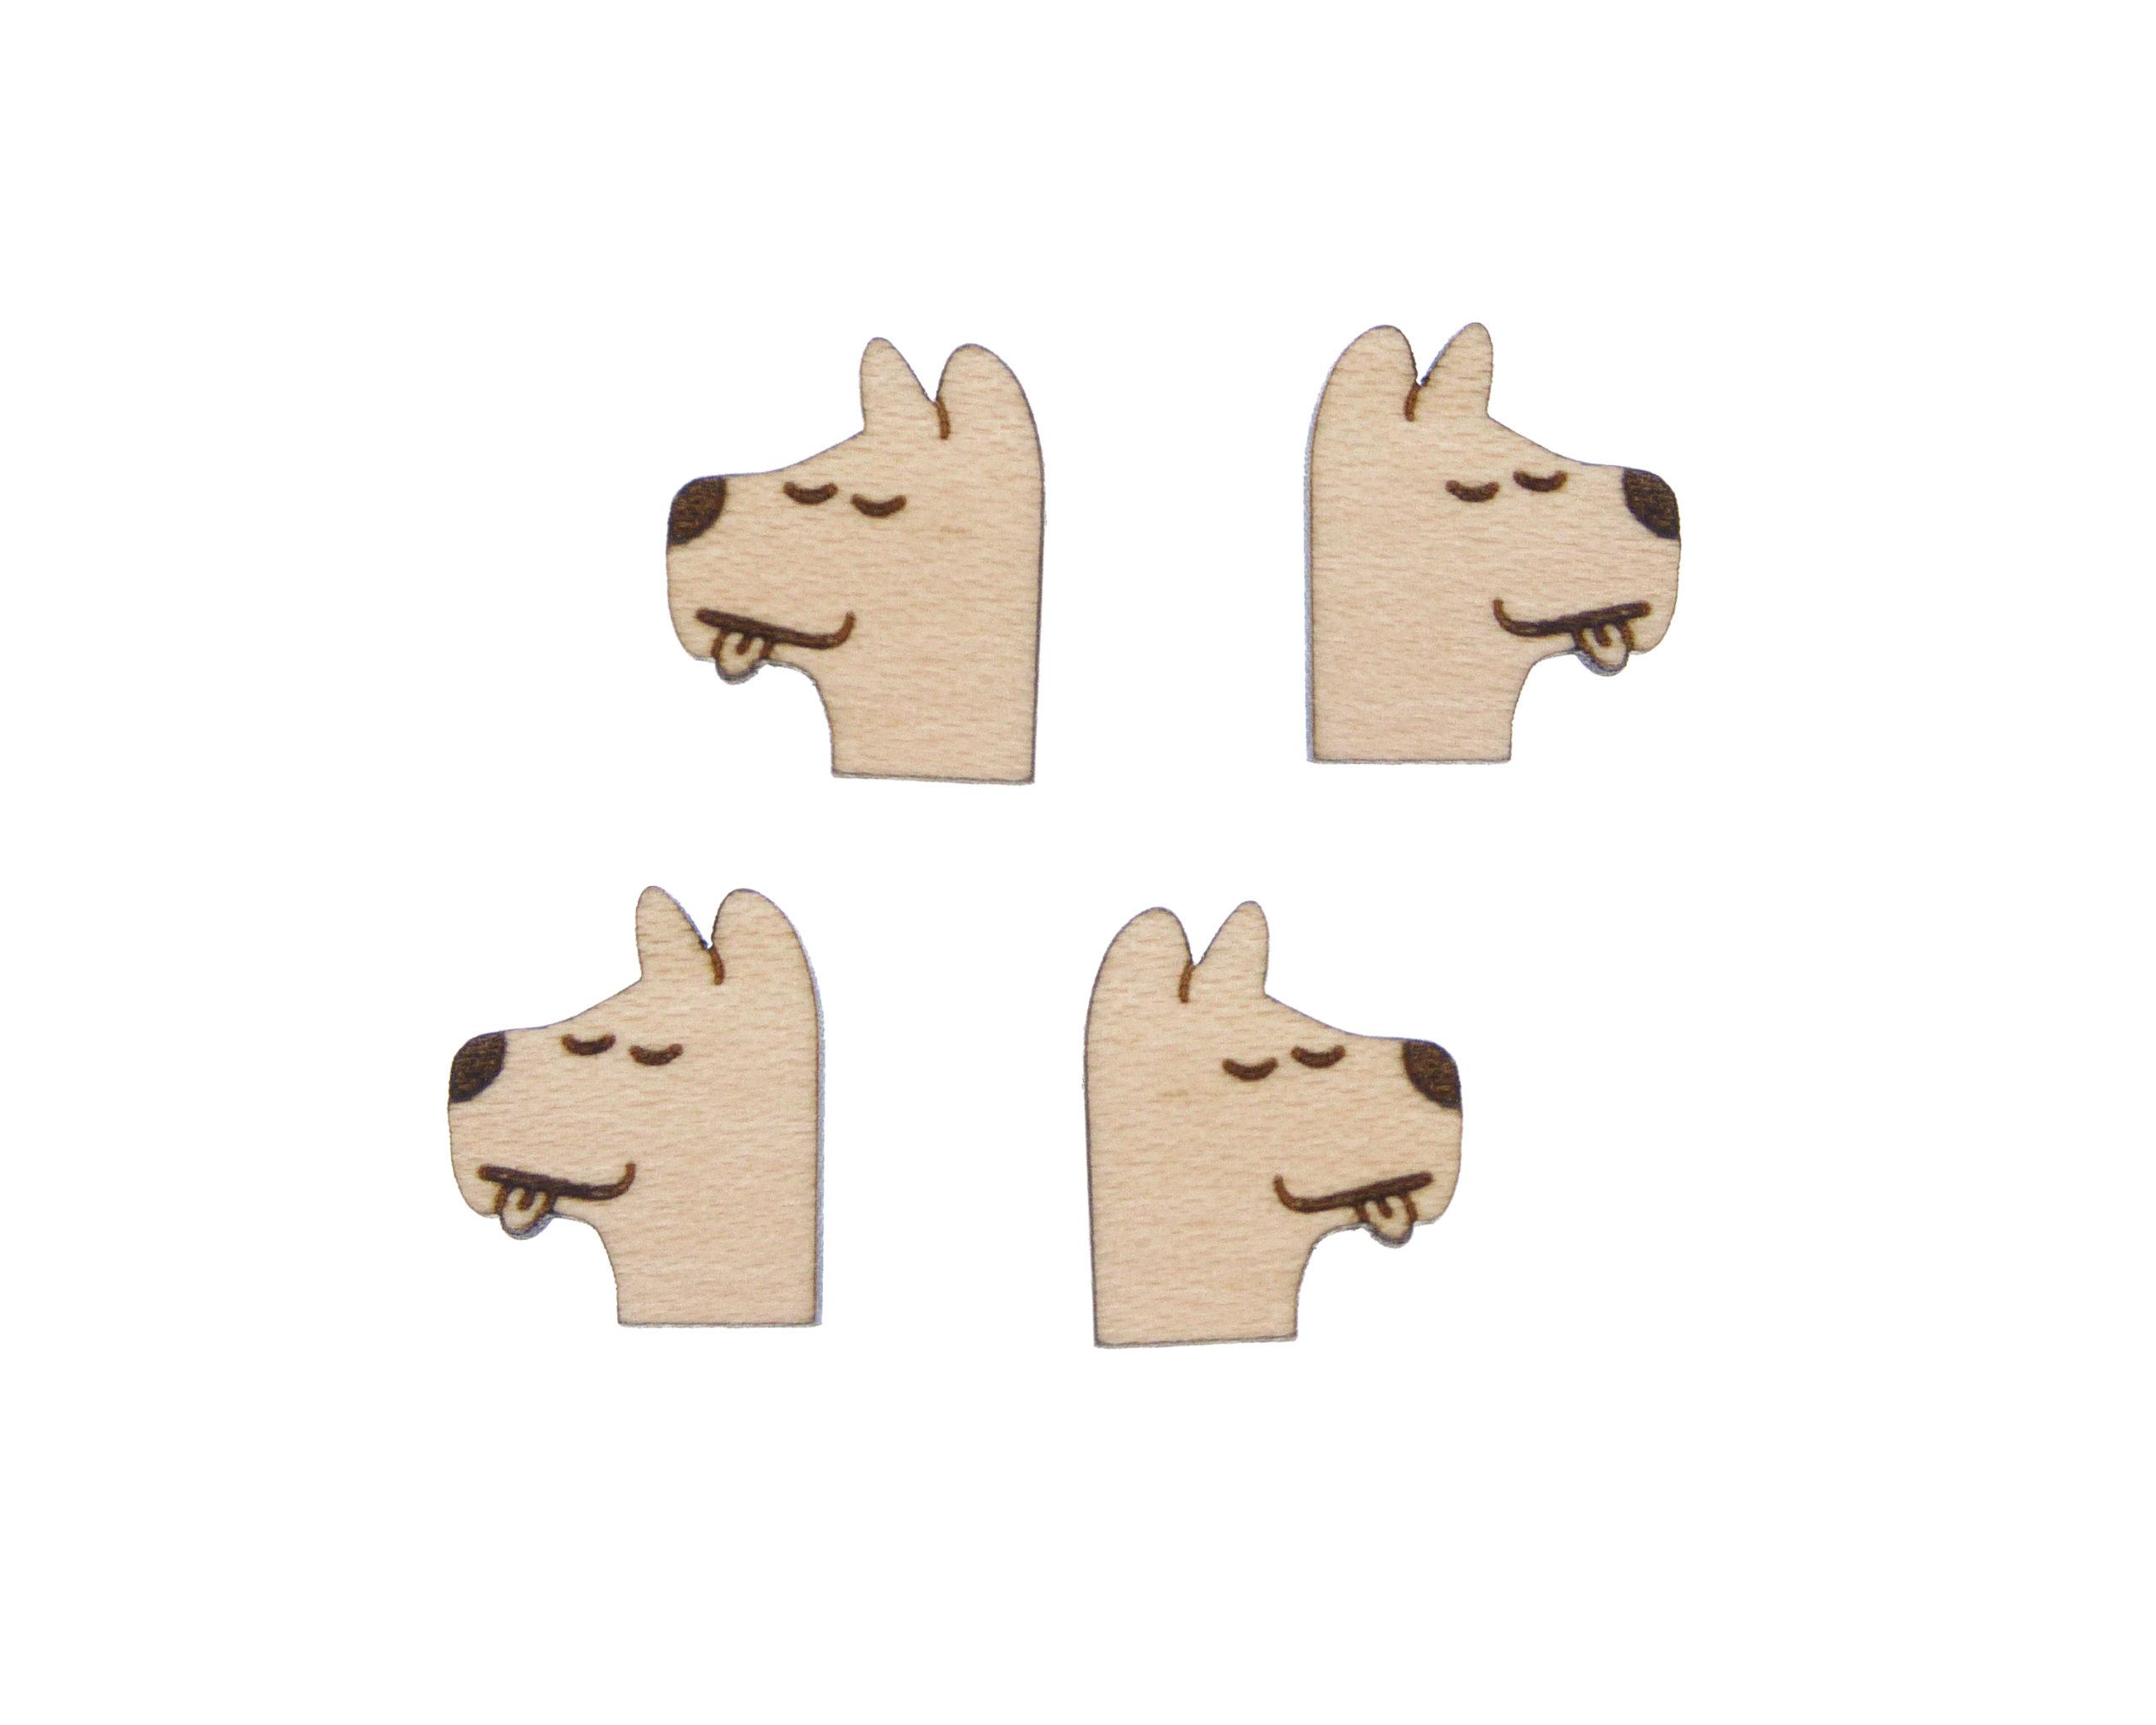 Happy Dog Engraved Wood Cabochons